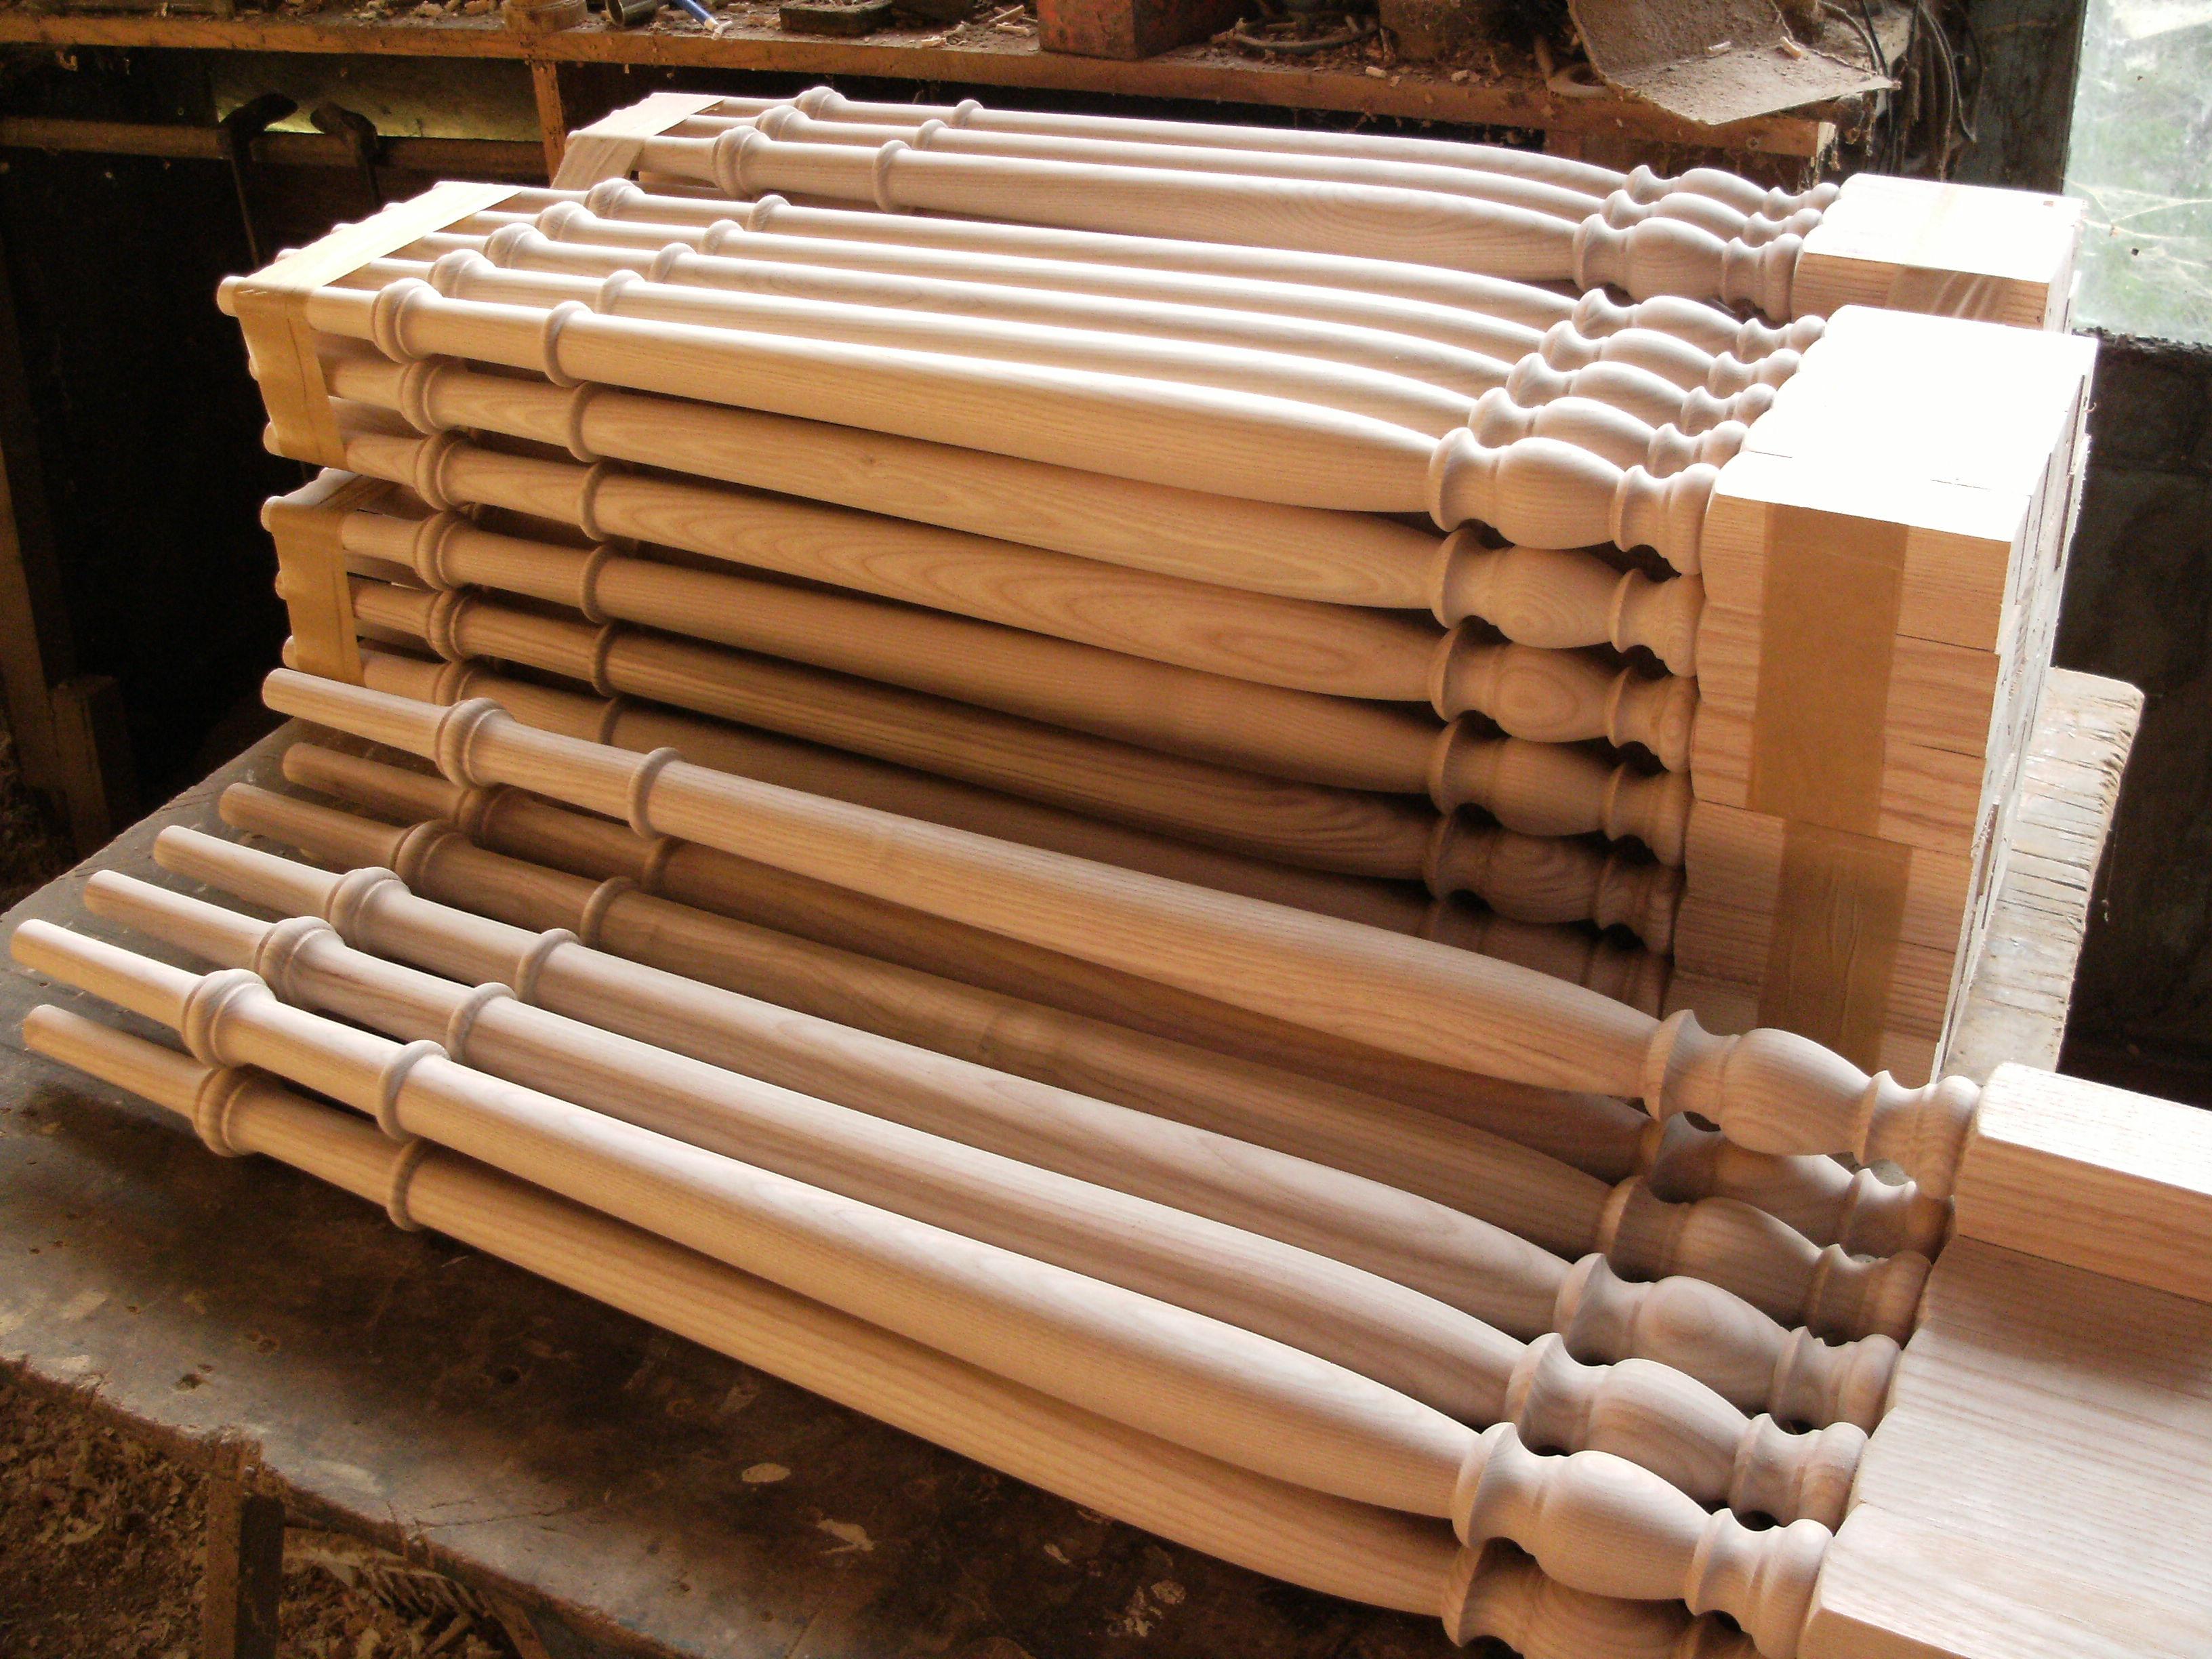 3 tr s beau escalier et garde corps cintr en fr ne. Black Bedroom Furniture Sets. Home Design Ideas